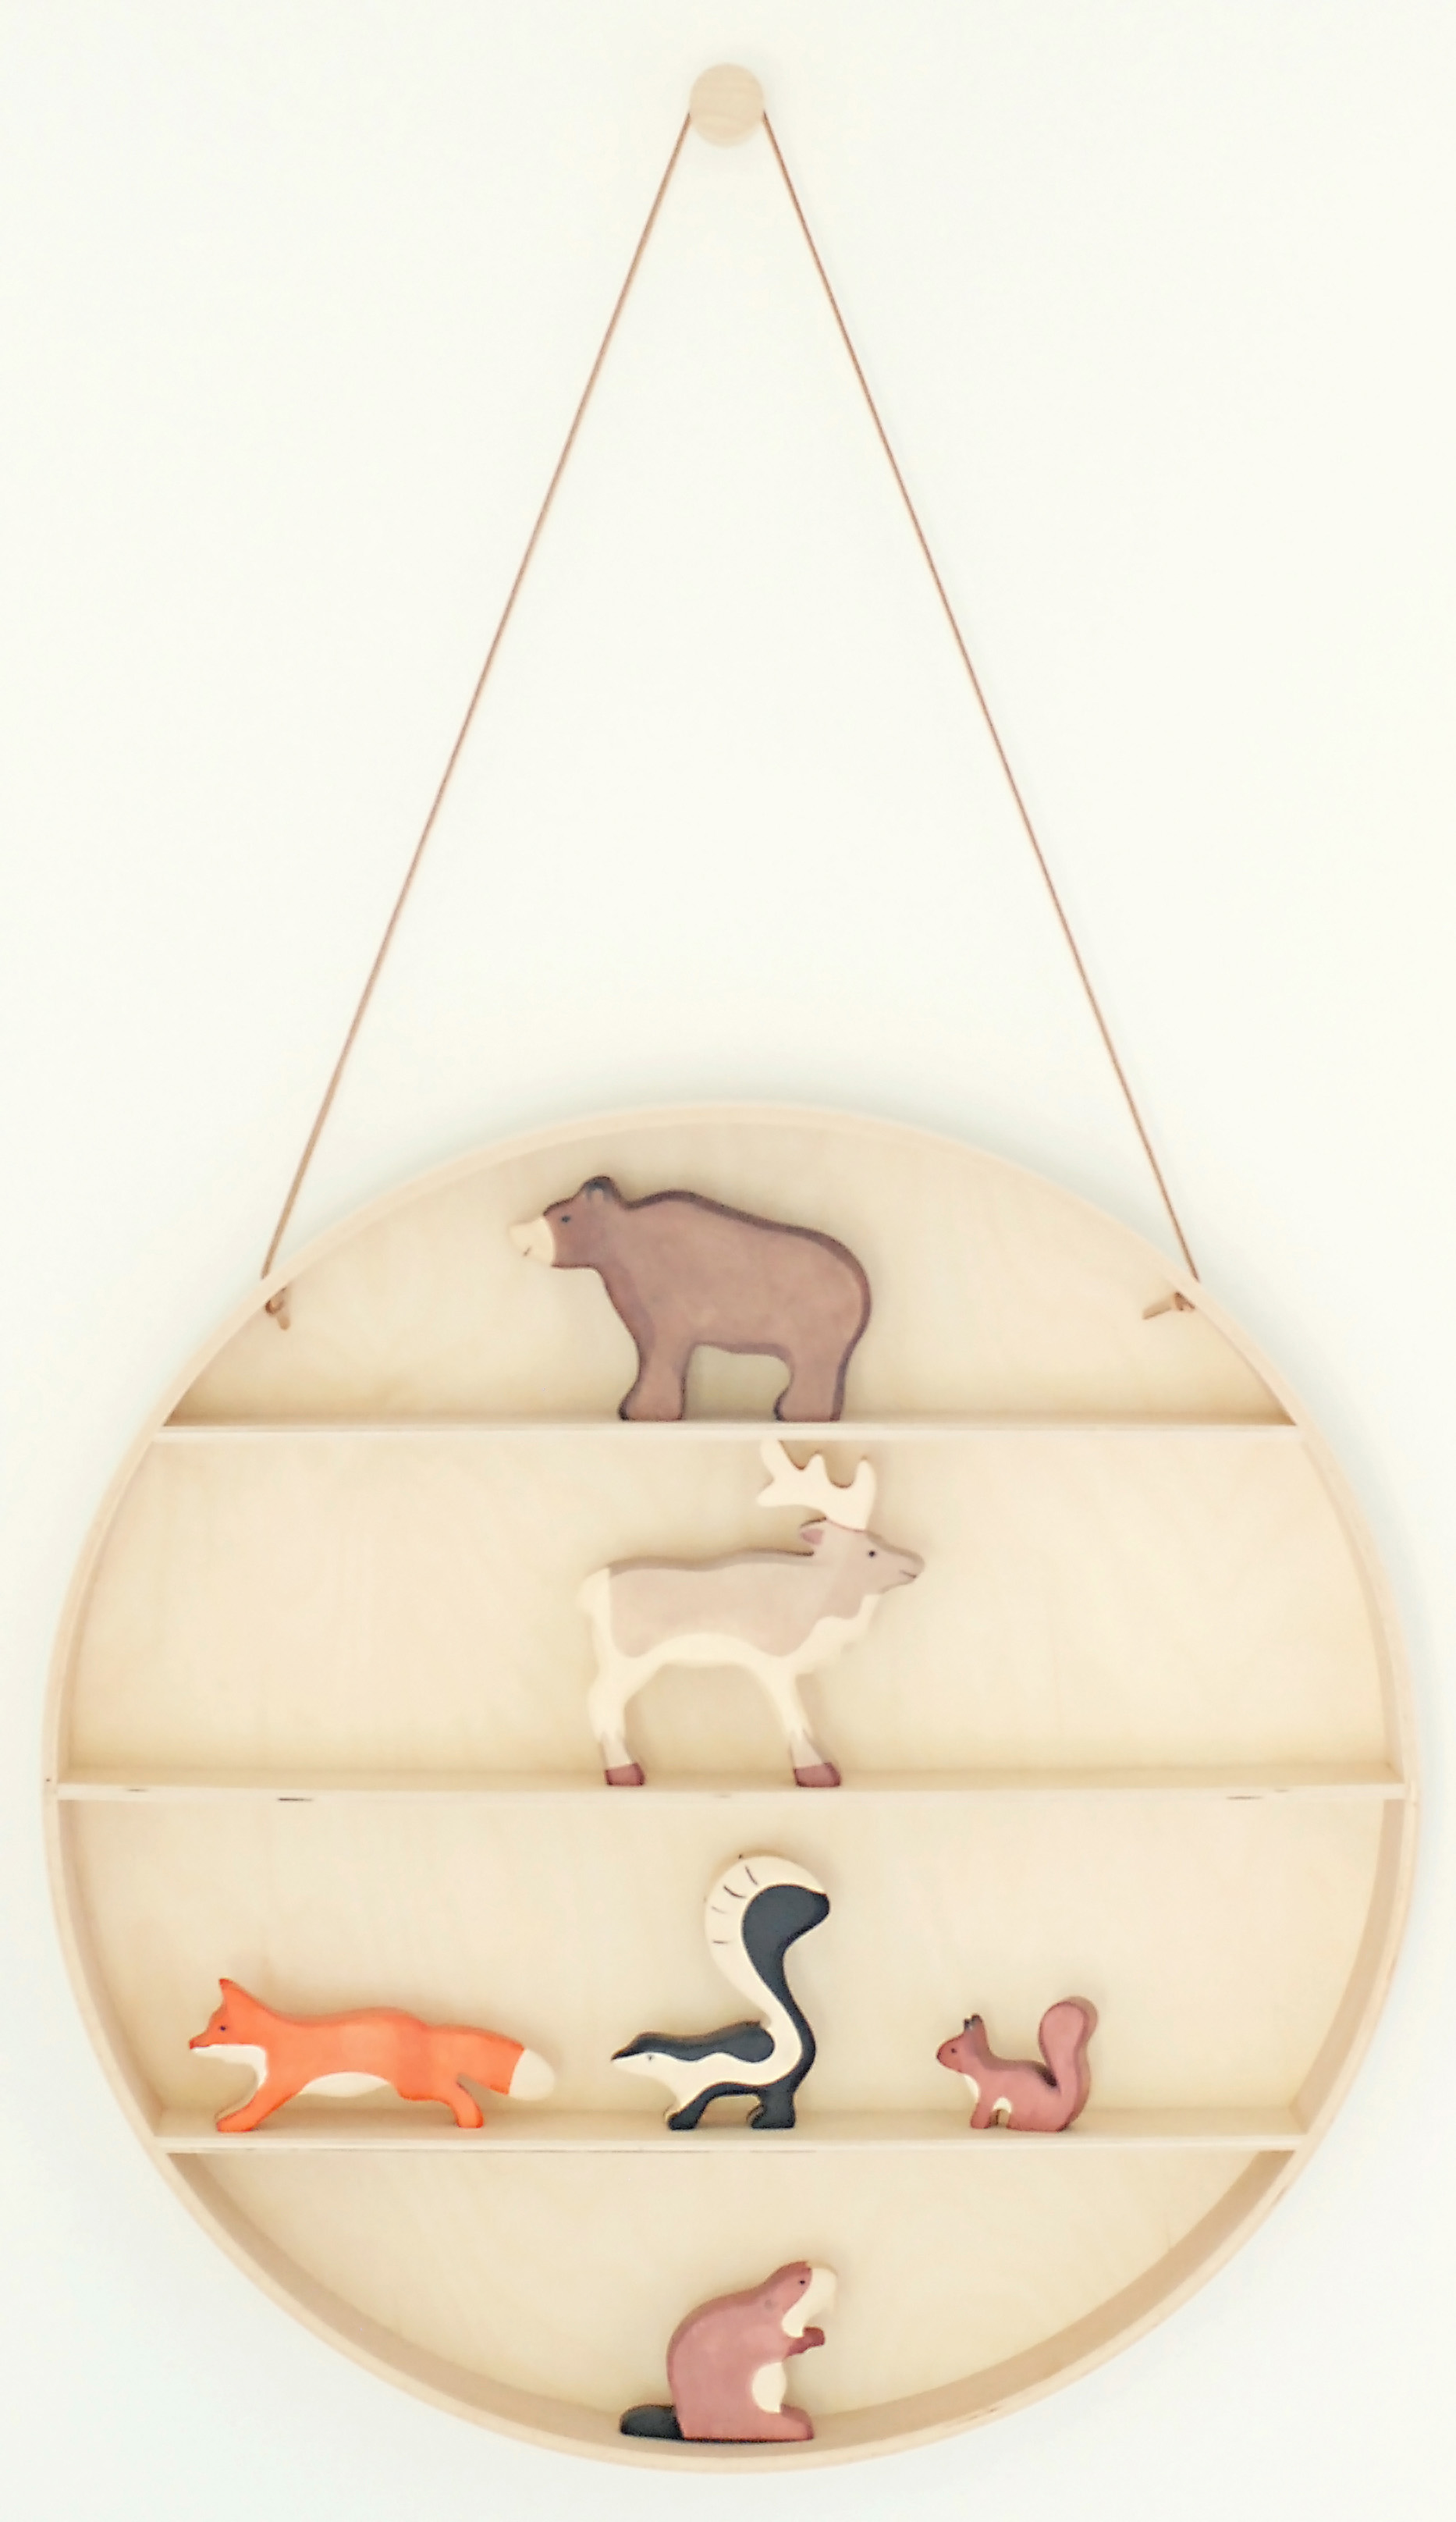 wood animals-edit.jpg